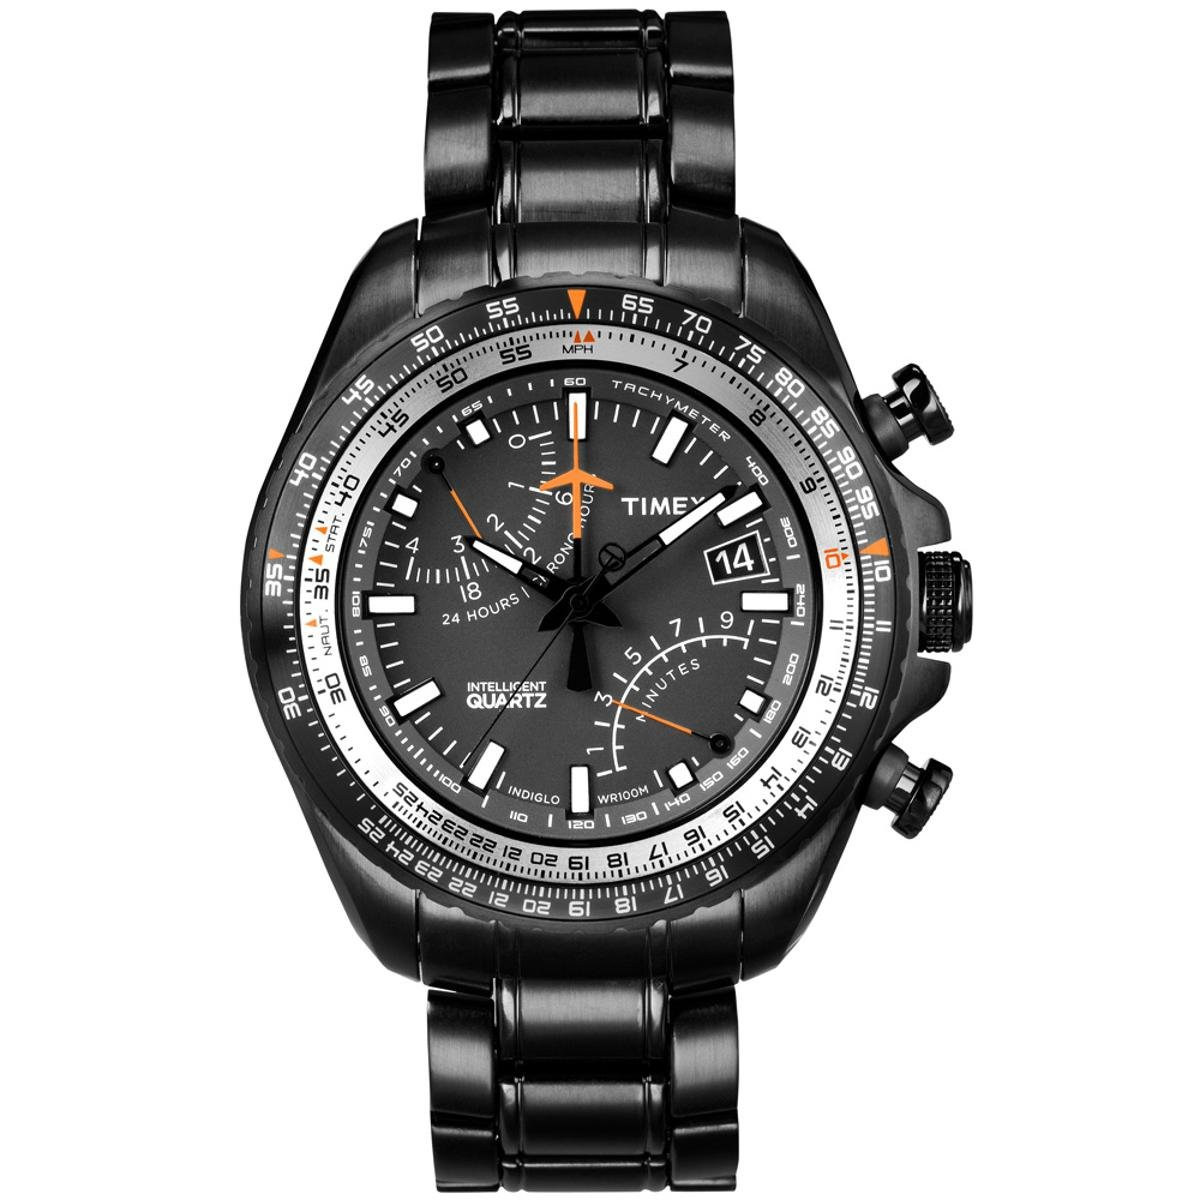 224bb26af15f Relógio Timex IQ Aviator Fly-back Cronógrafo T2P103PL TI Preto T2P103PL TI  - Compre Agora